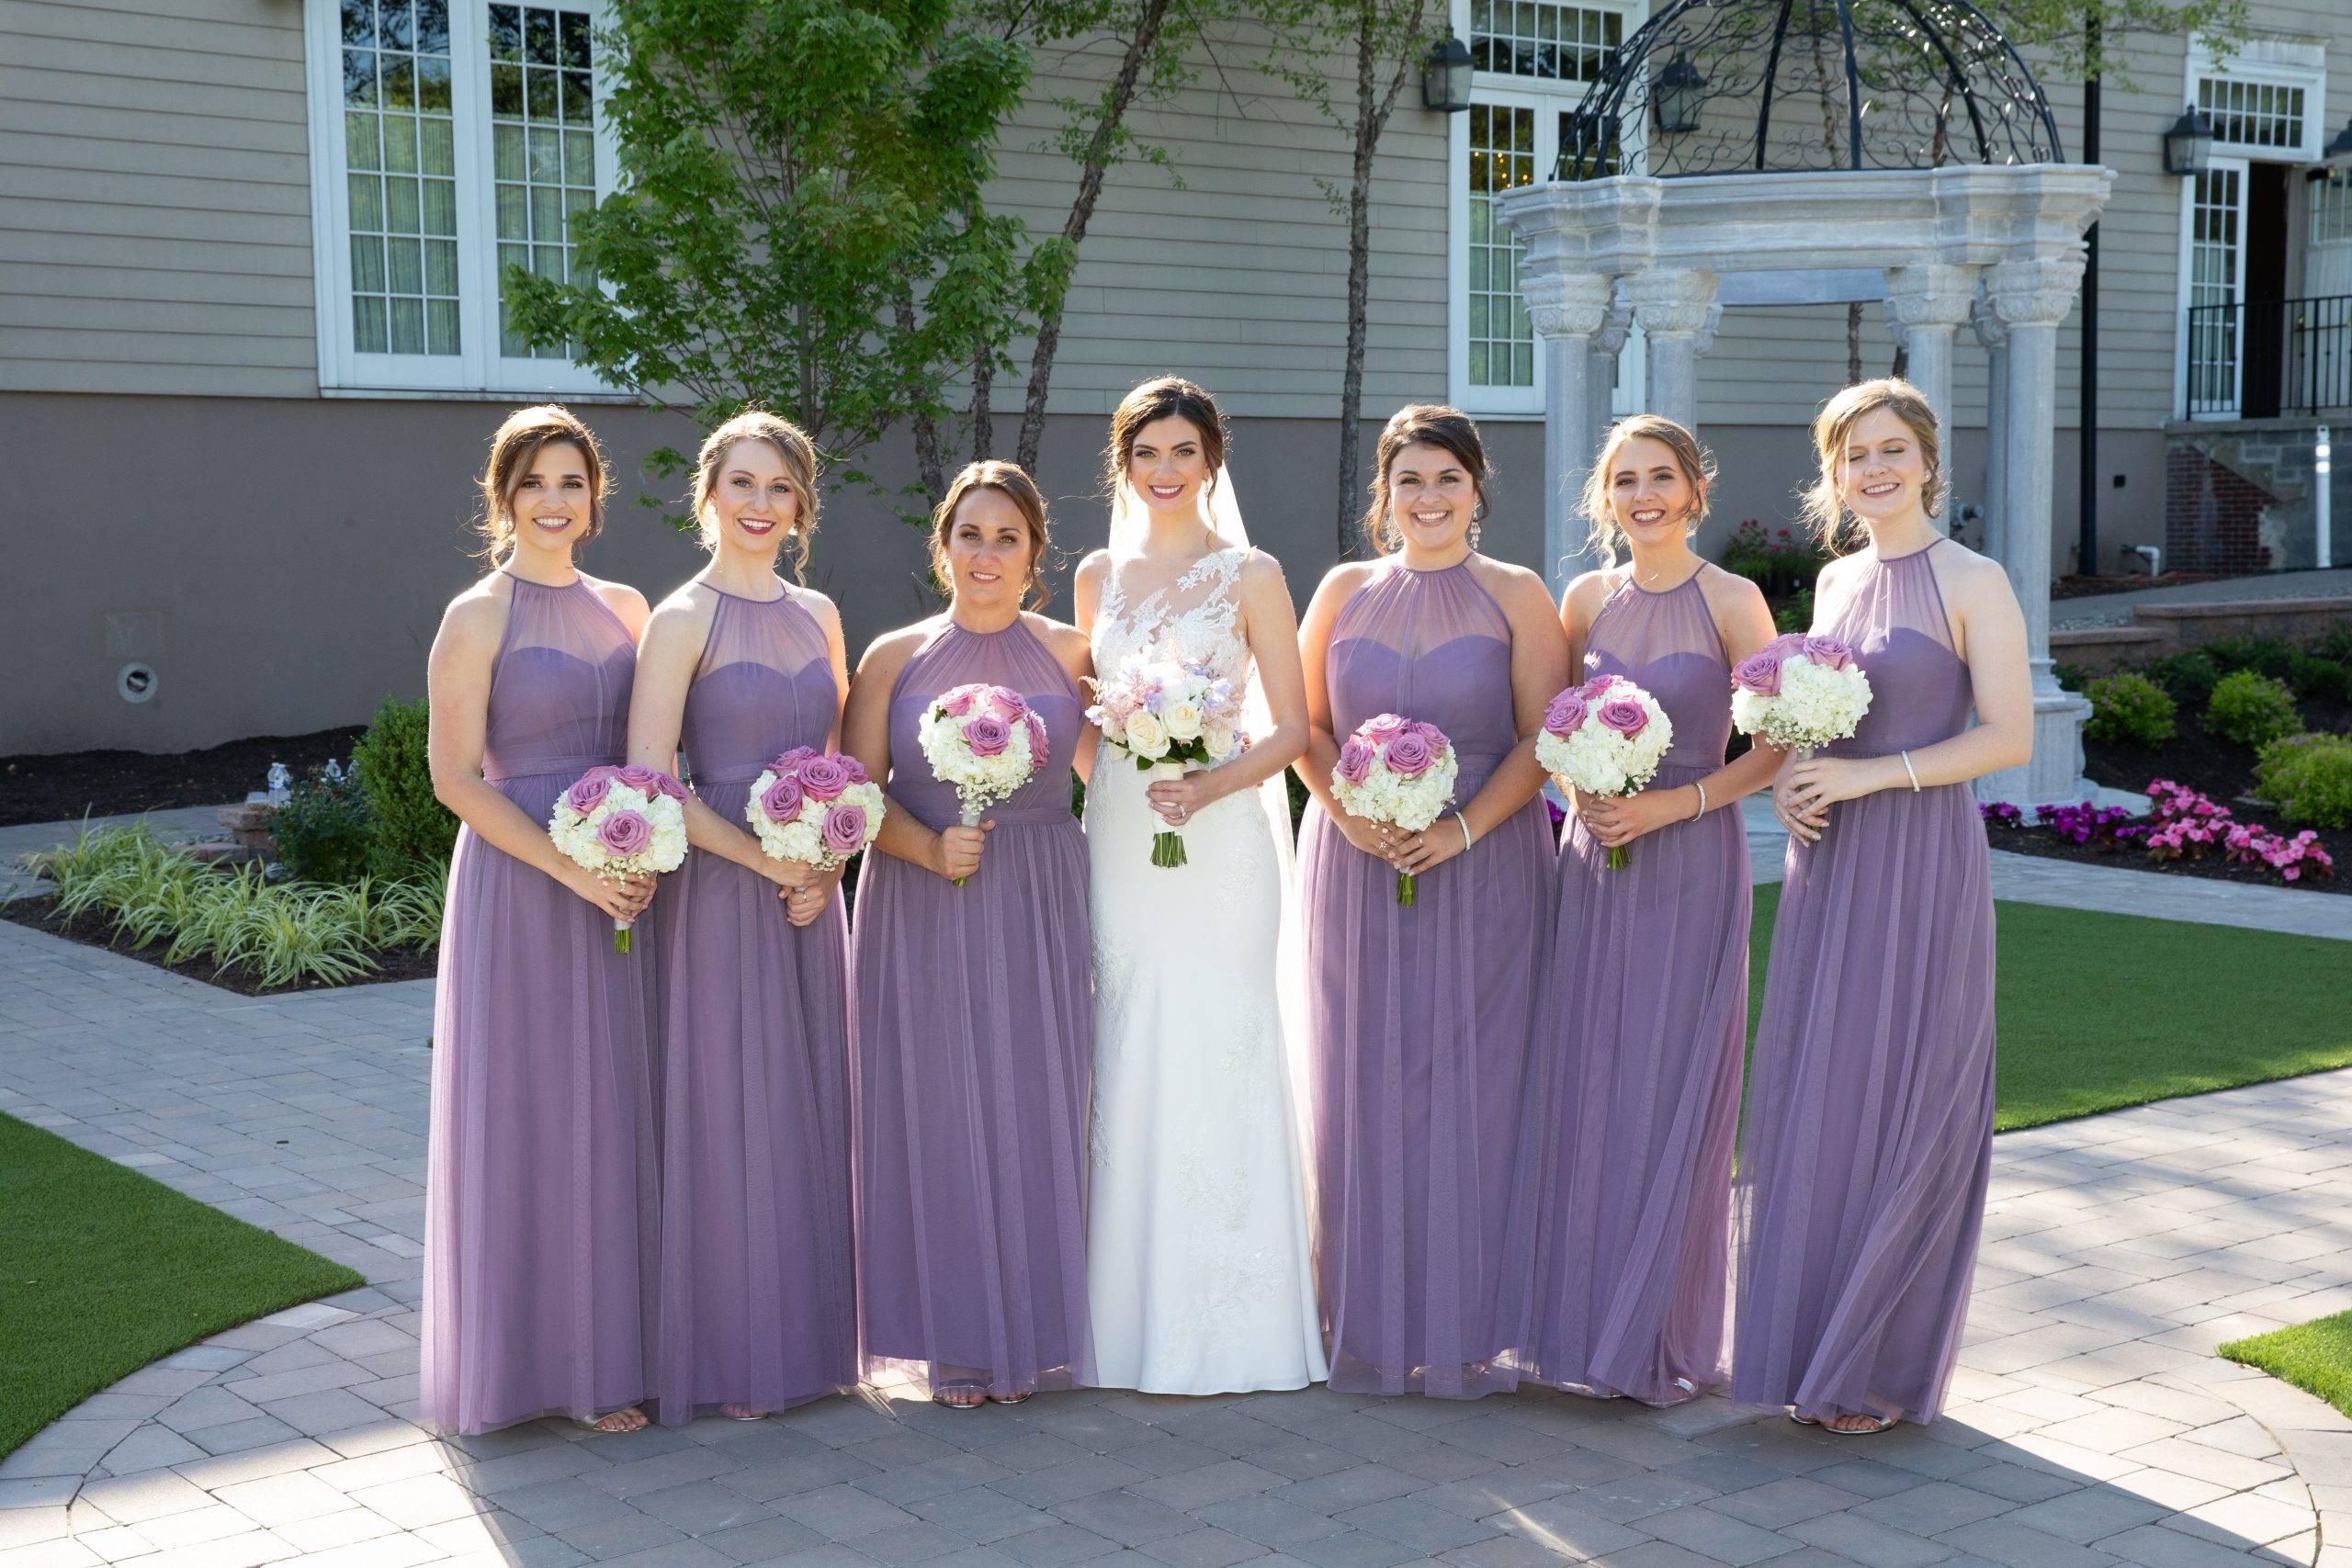 Meadow Wood bride and bridesmaids